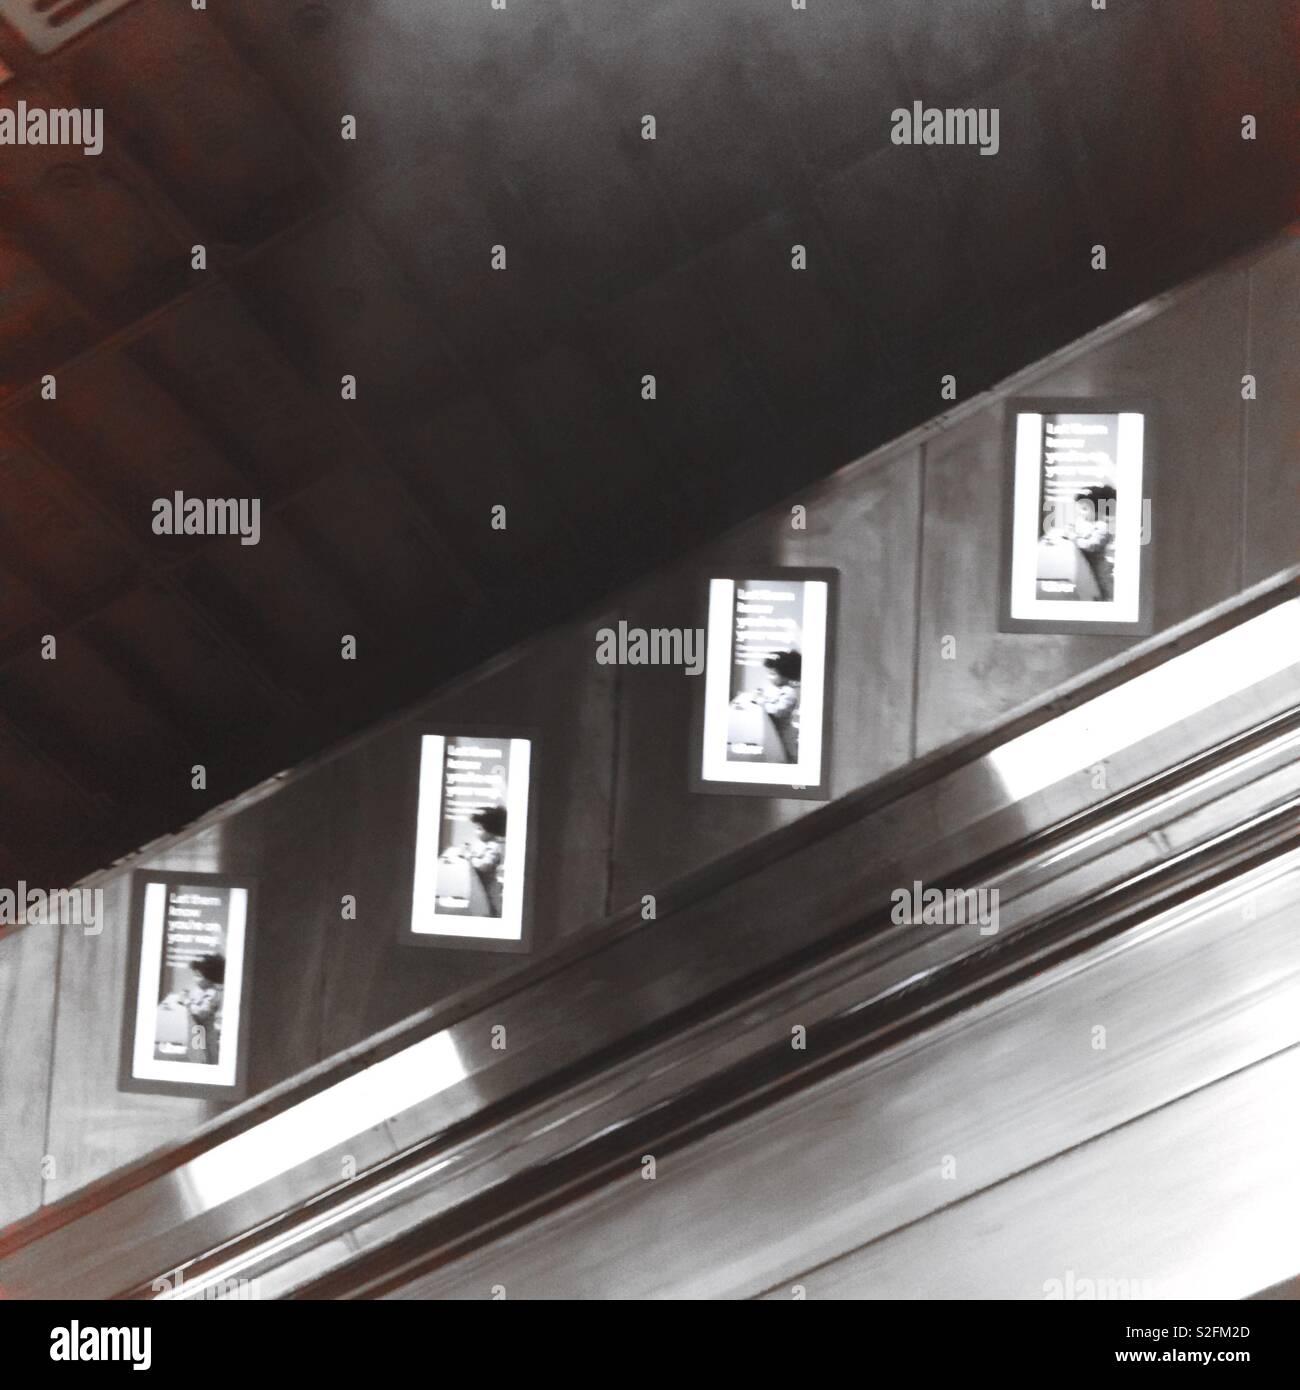 Tube station London Underground posters on wall next to customer escalators - Stock Image